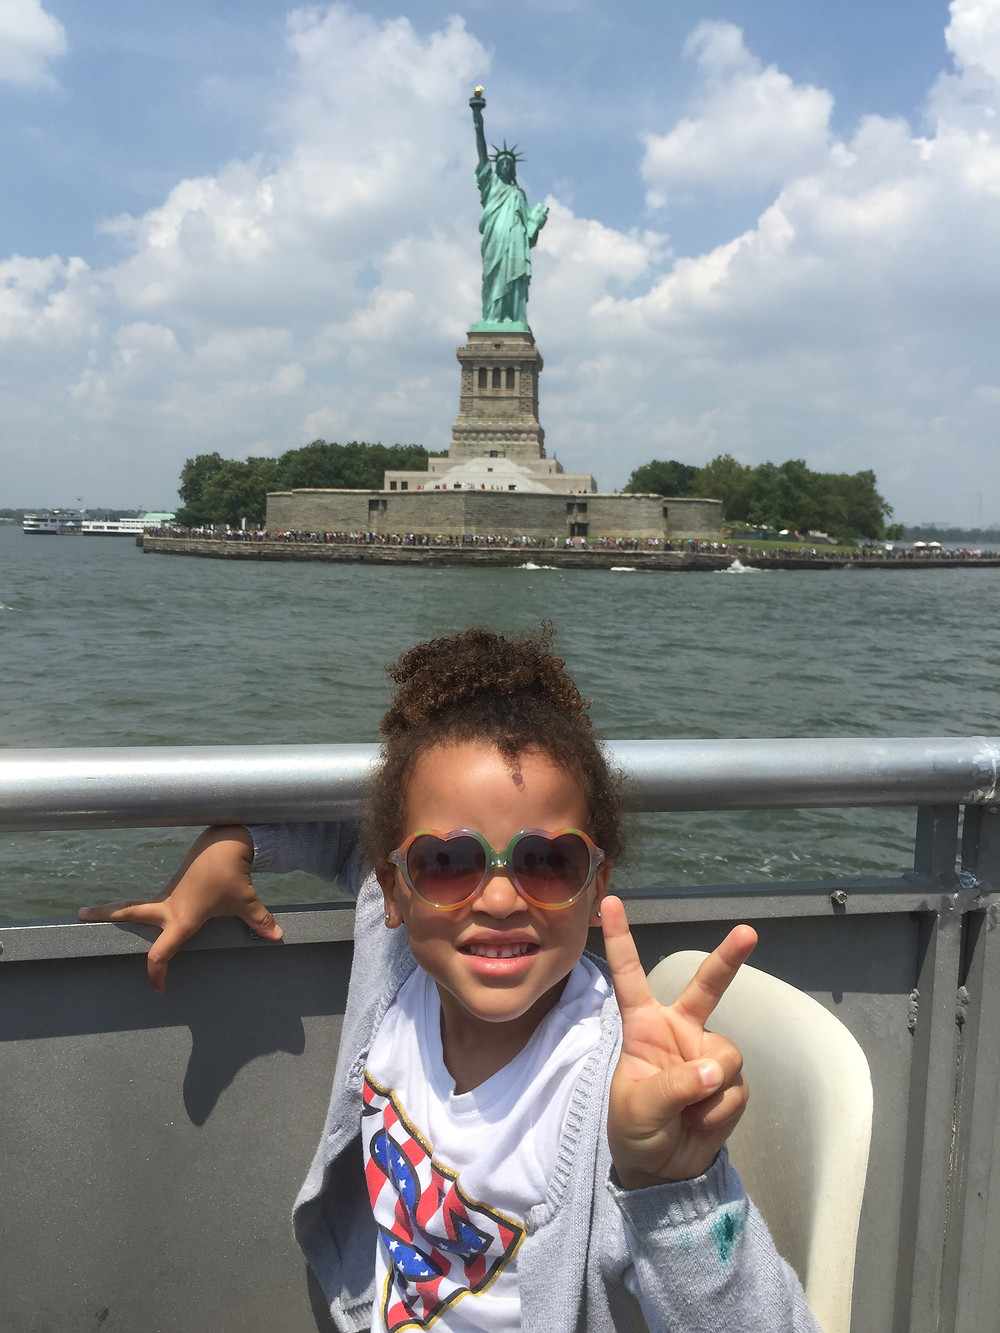 Loreva fun day at the Statue of Liberty